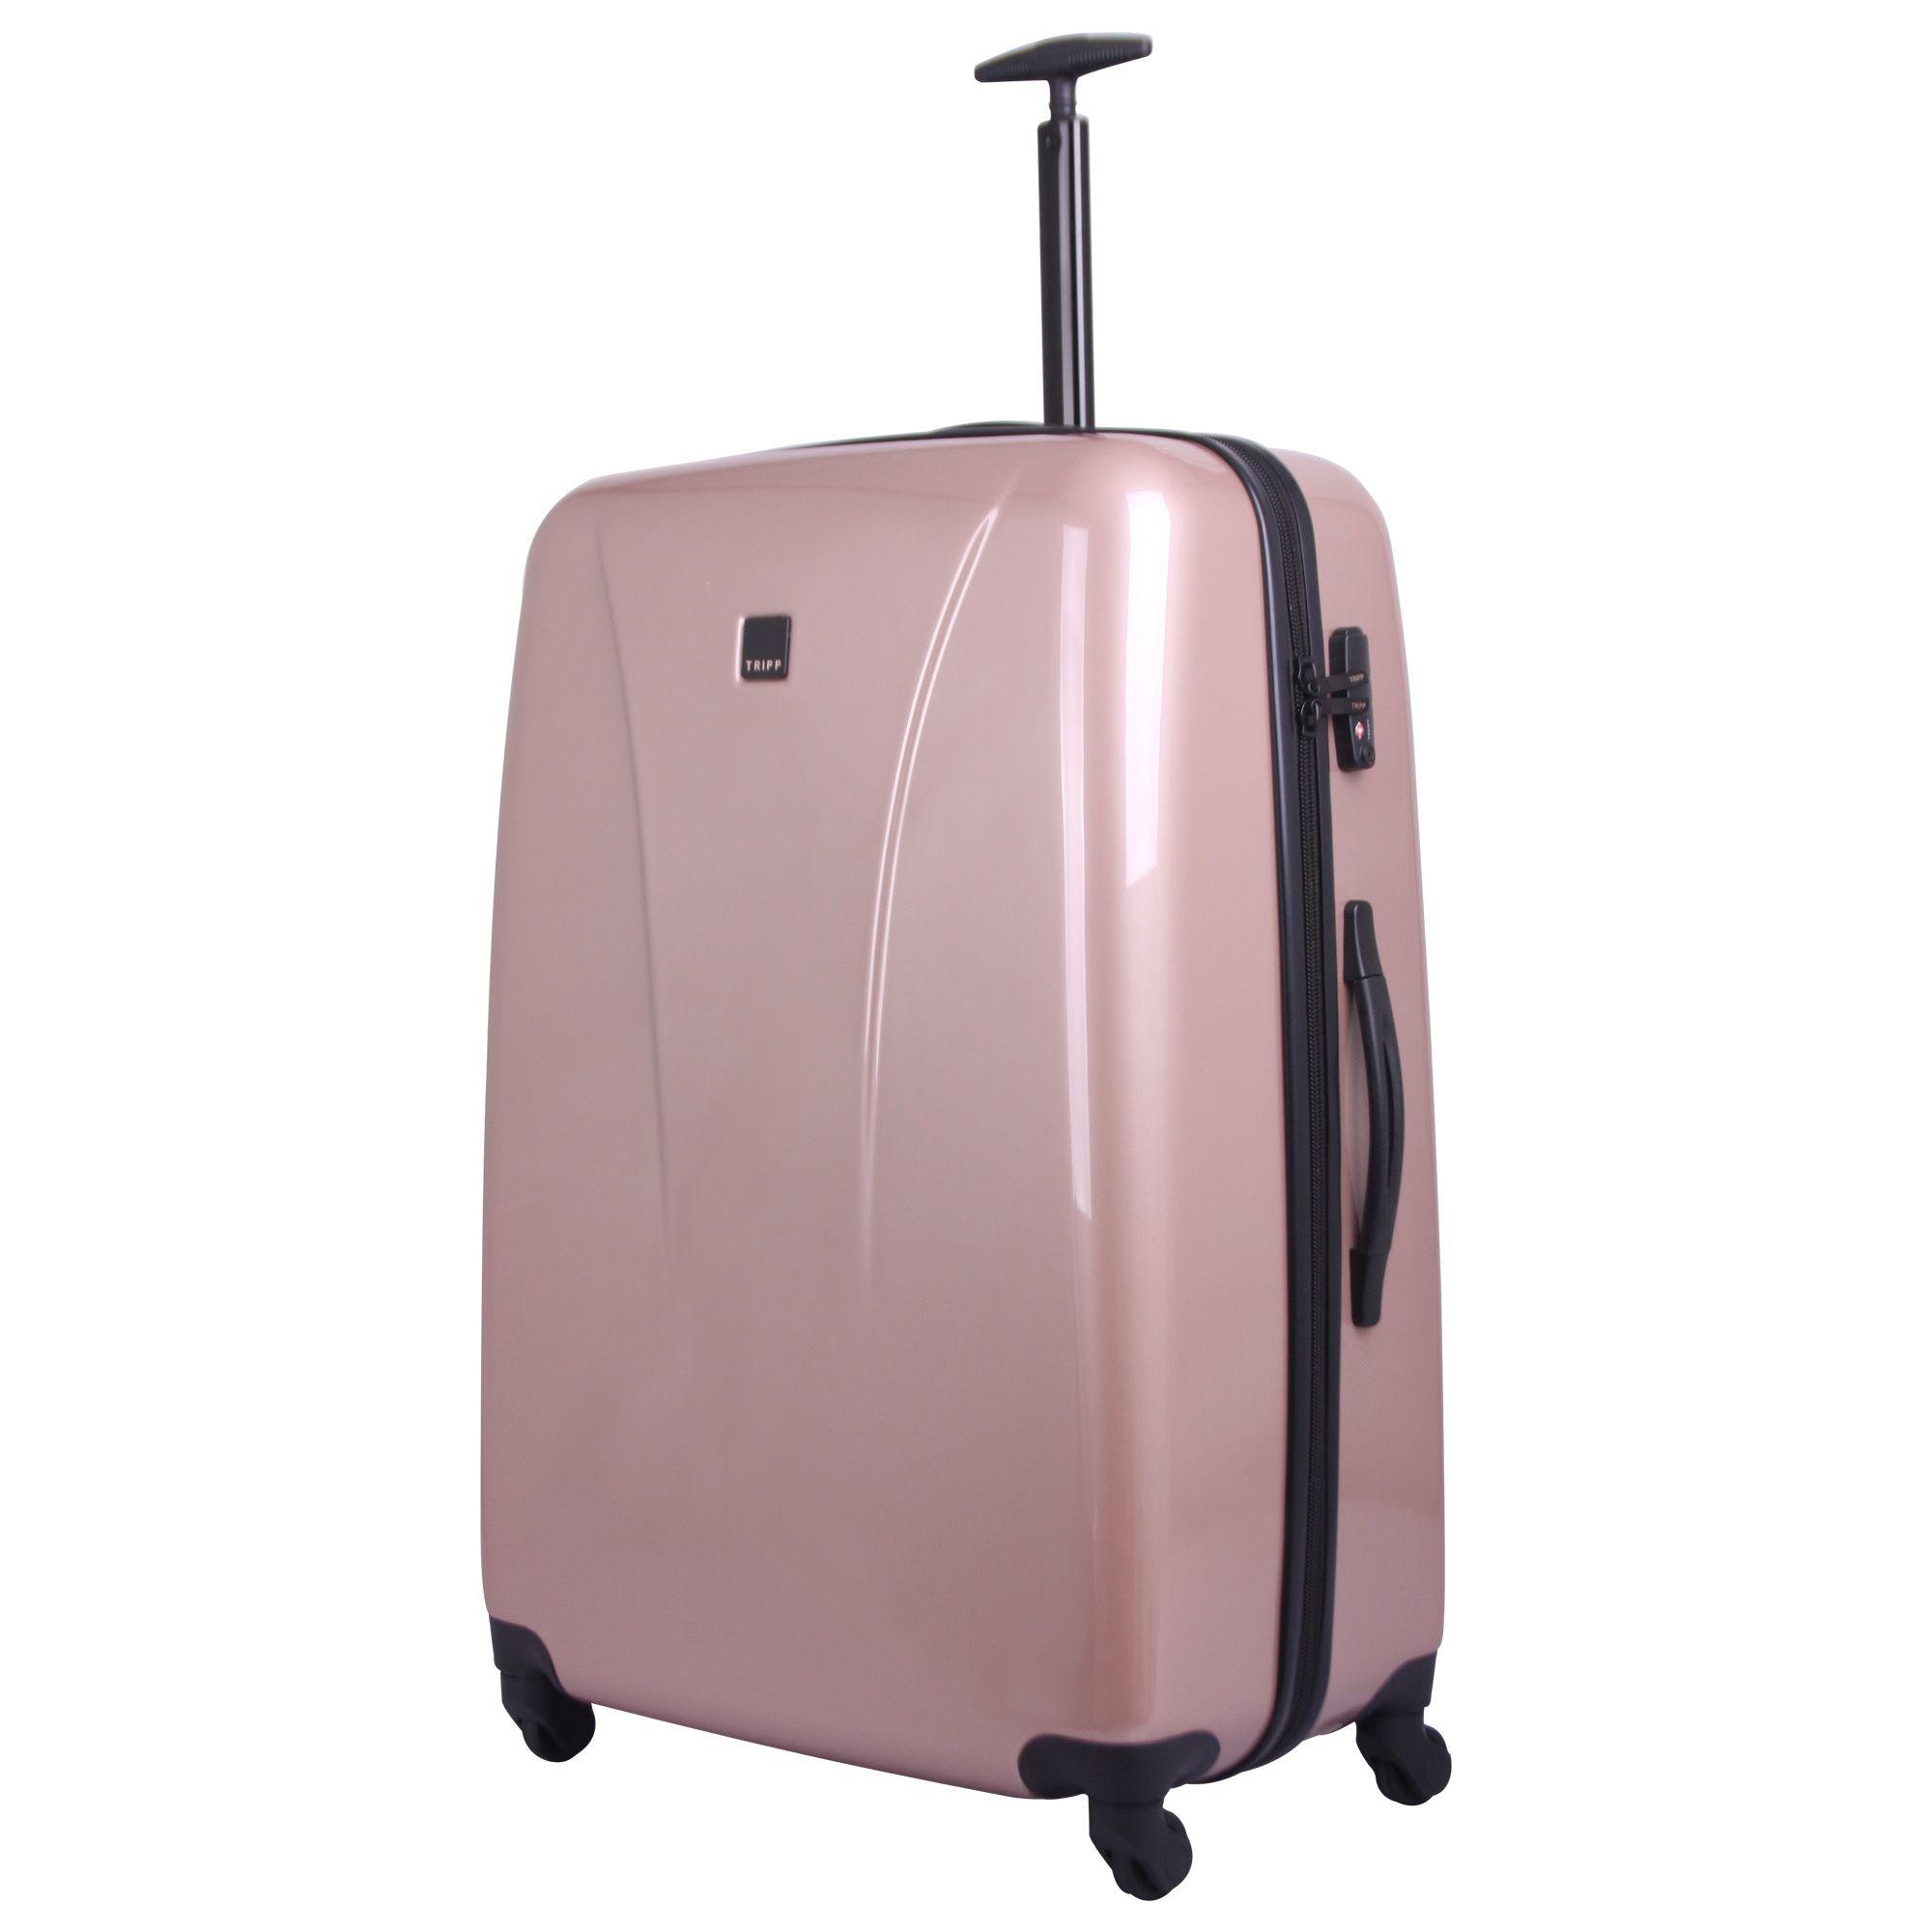 tripp blush 39 chic 39 large 4 wheel suitcase hard shell. Black Bedroom Furniture Sets. Home Design Ideas